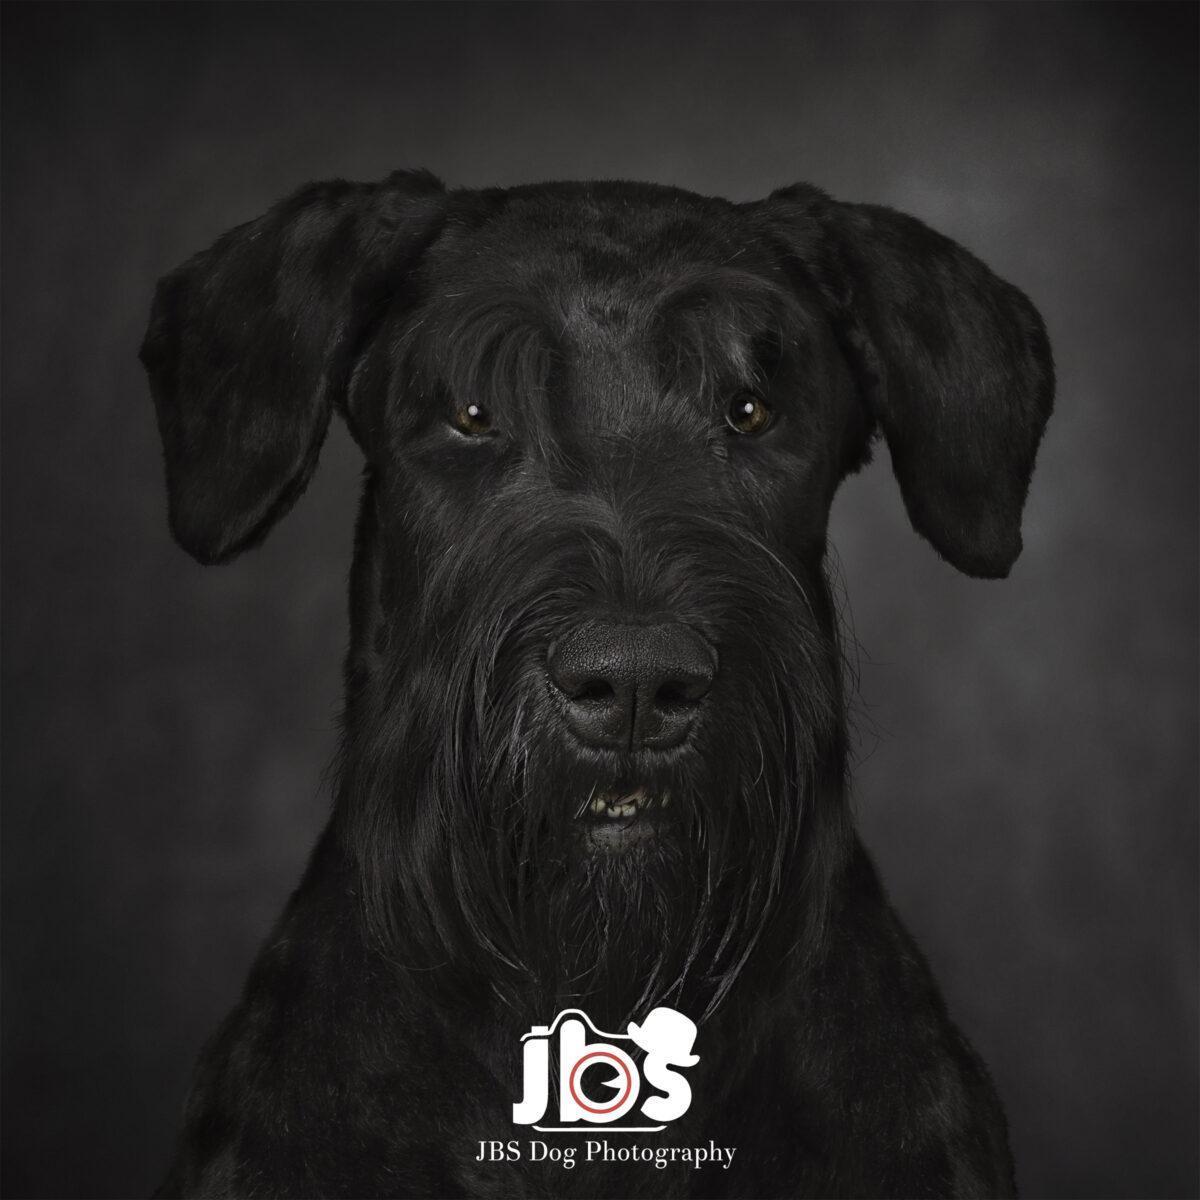 Giant Schnauzer Dog Photography - JBS Dog Photography | JBS Dog Photography